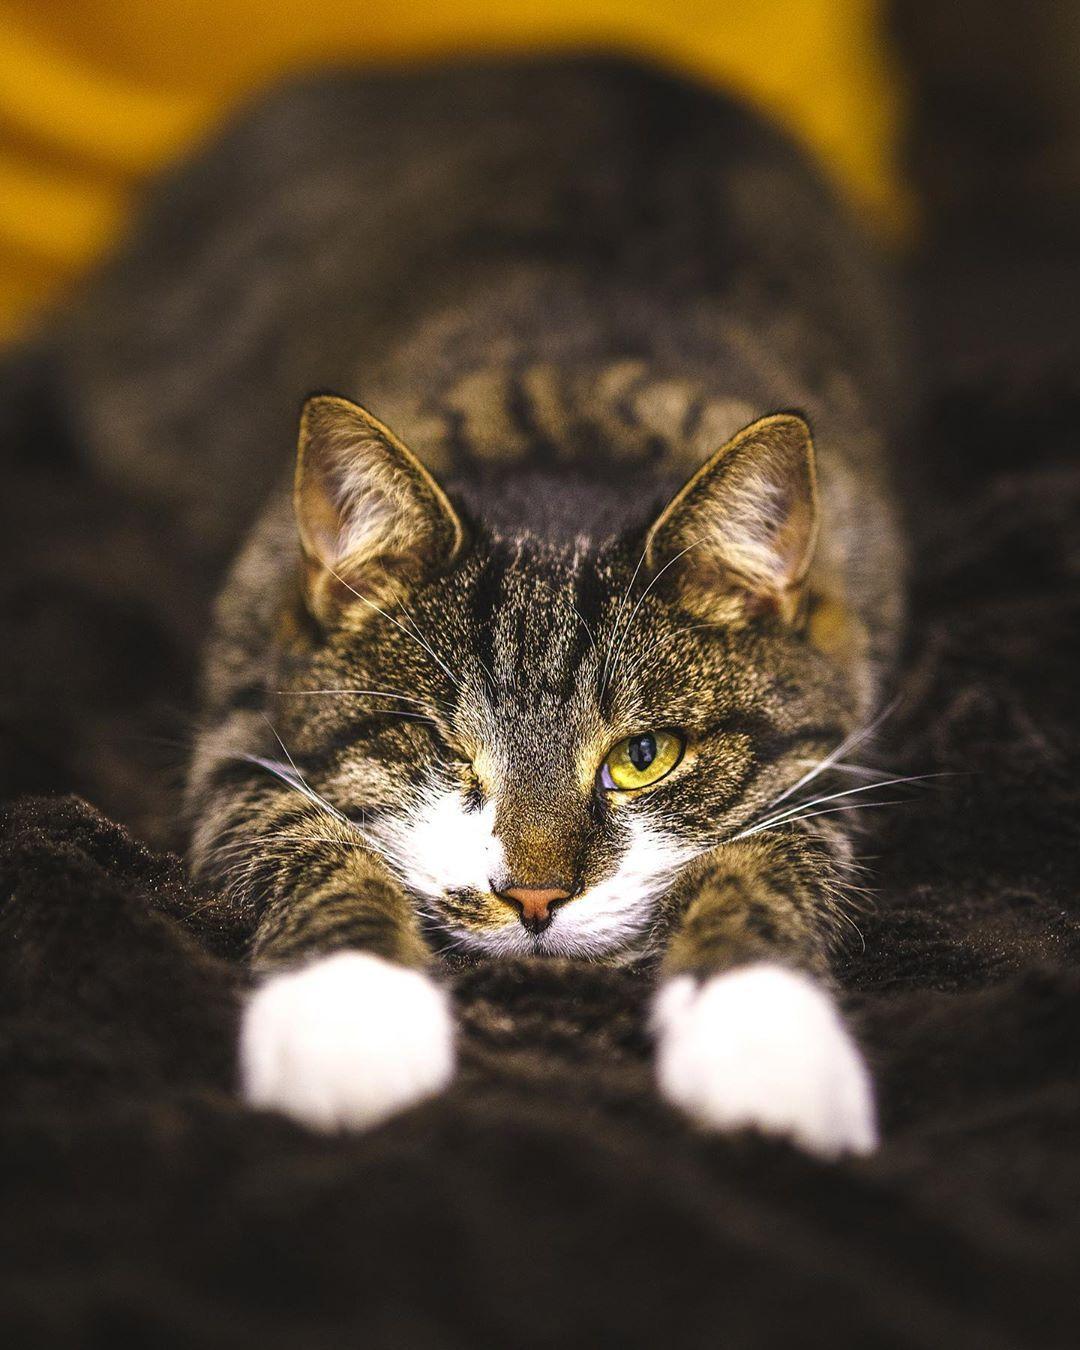 Im tired . . . . . . #cat #catsofinstagram #cats #catstagram #cats_of_world #cats_of_instagram #catsanddogs #catlover #catholic #catering #catlovers #catlovers #catlife #catsagram #fluffycat #catslife #oneryedcat #oneeyedcatsclub #oneeyedcat #miau Instagram BridgeIm tired...